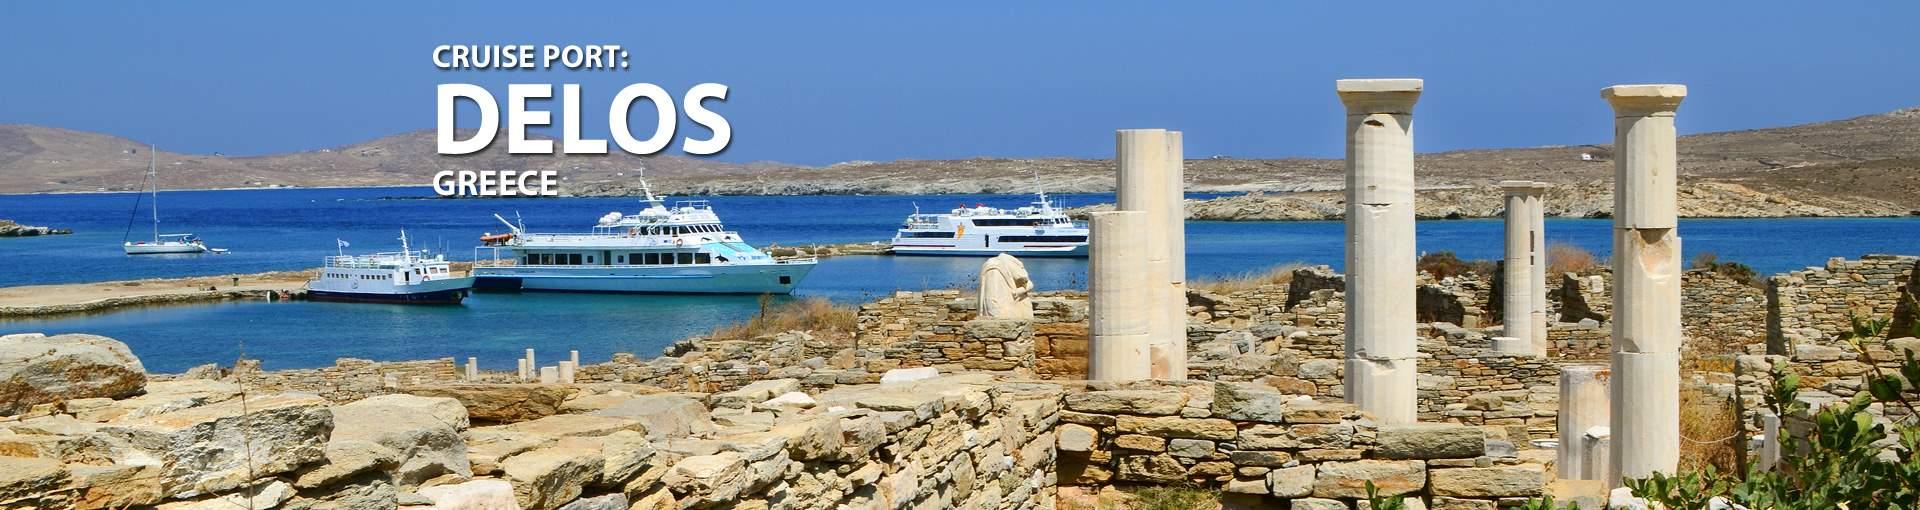 Cruises to Delos, Greece